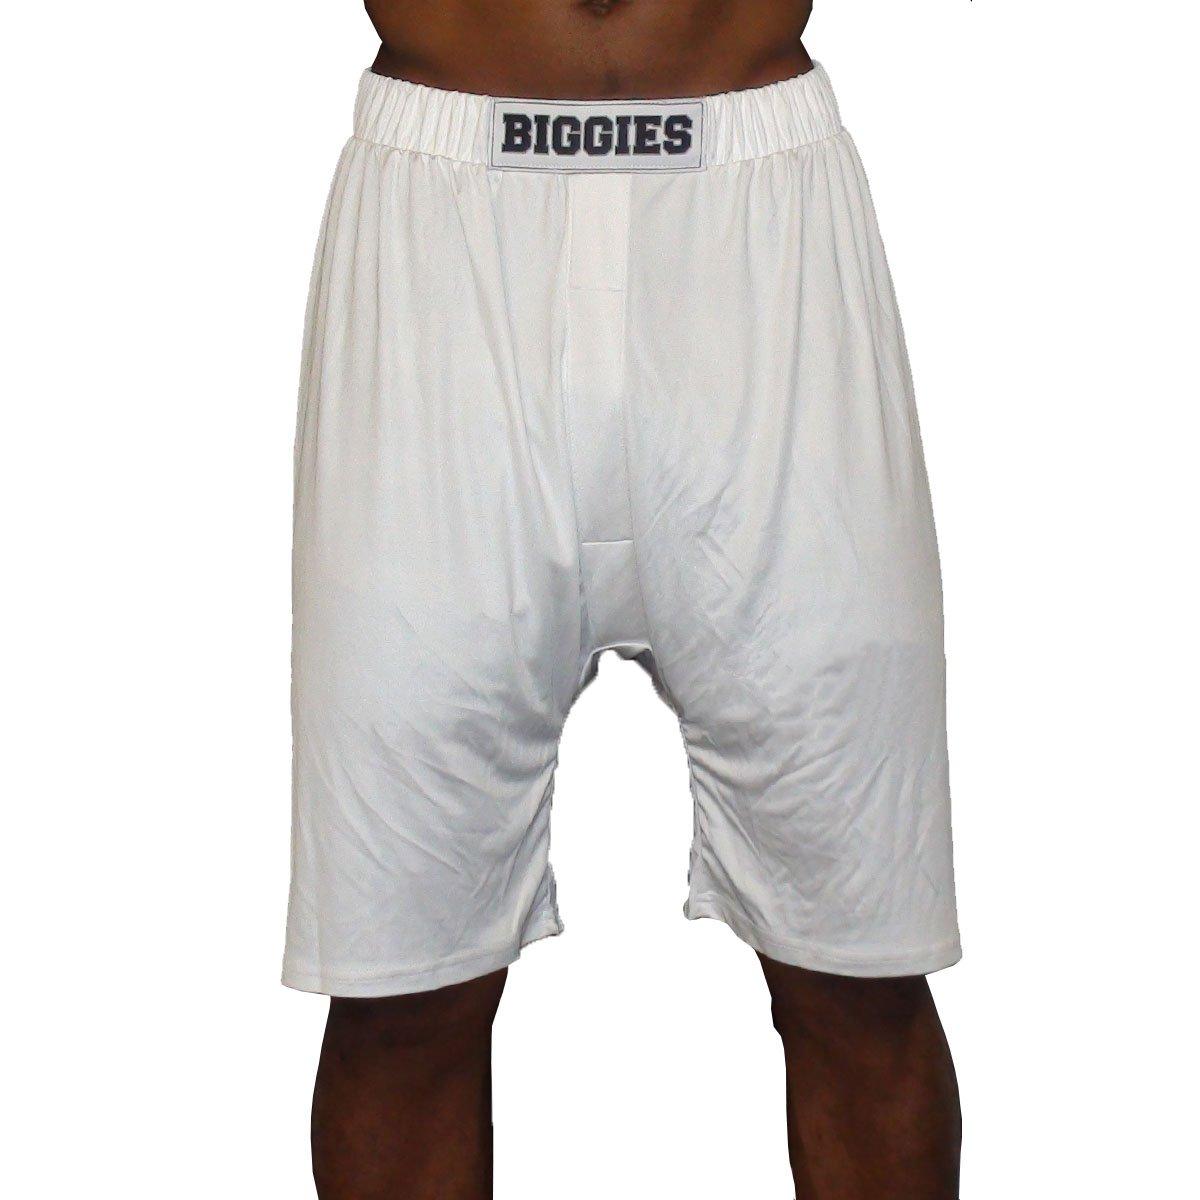 Biggies Boxers Underwear Mens Silk Jersey Long Leg